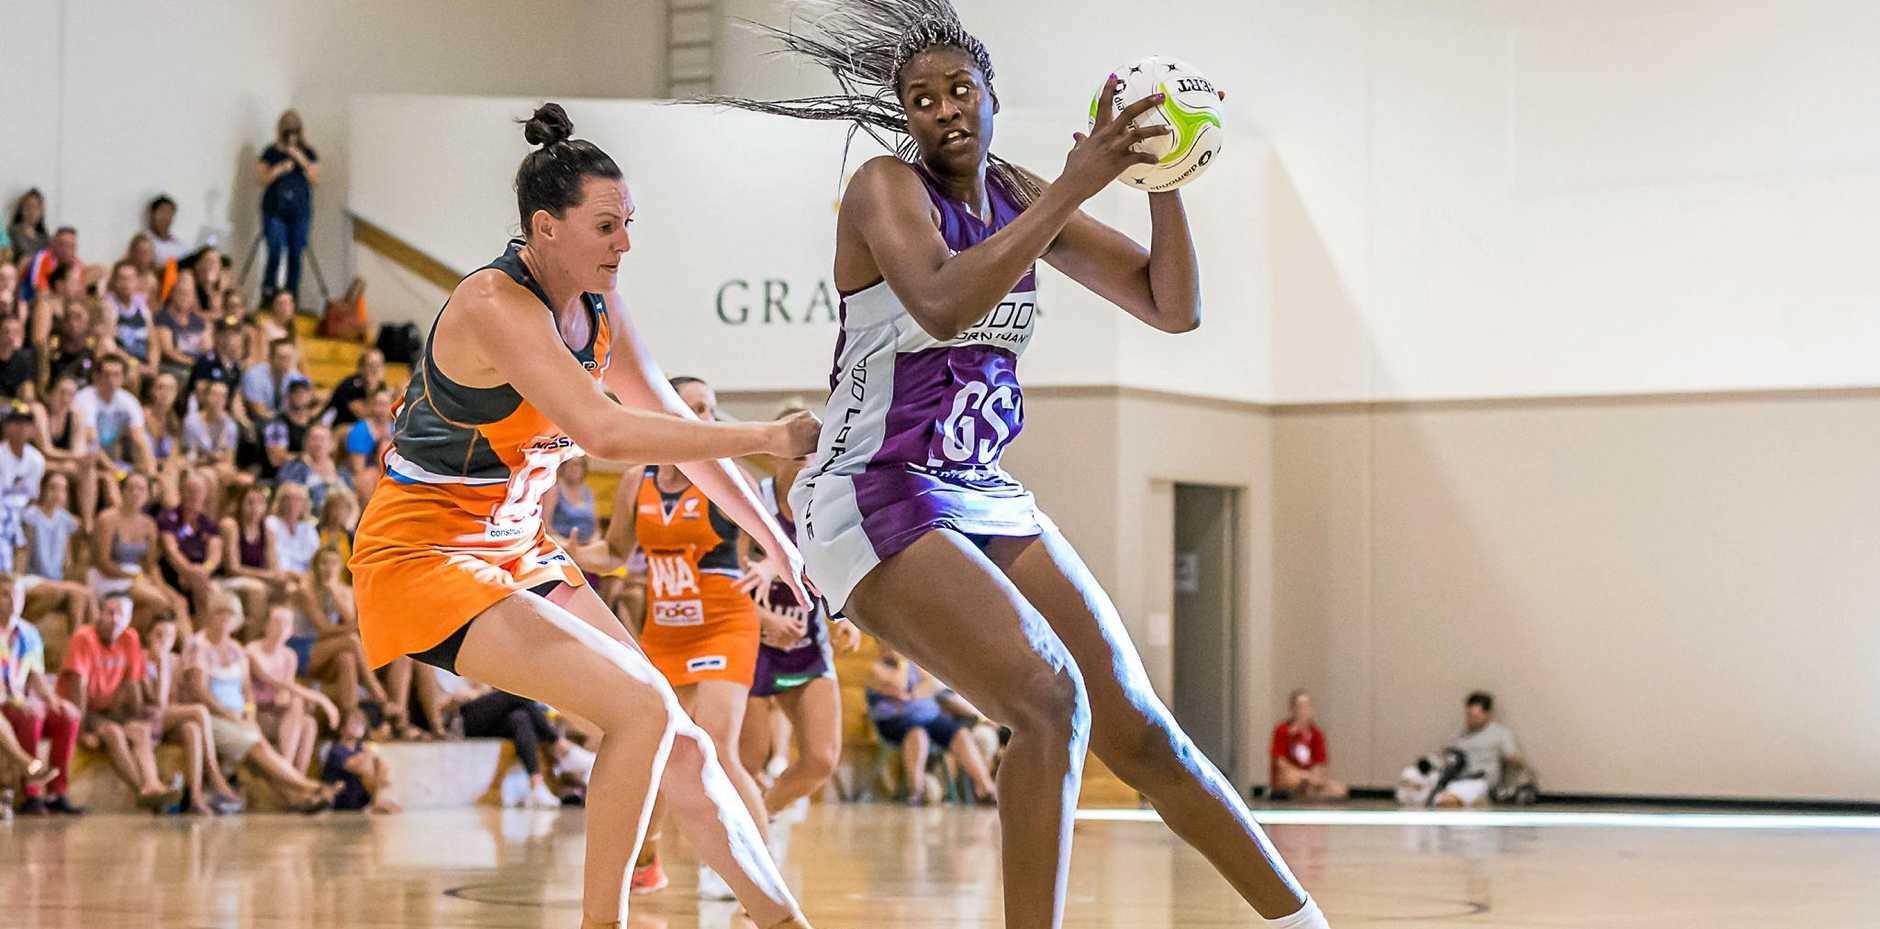 Romelda Aiken in control during a recent practice match.